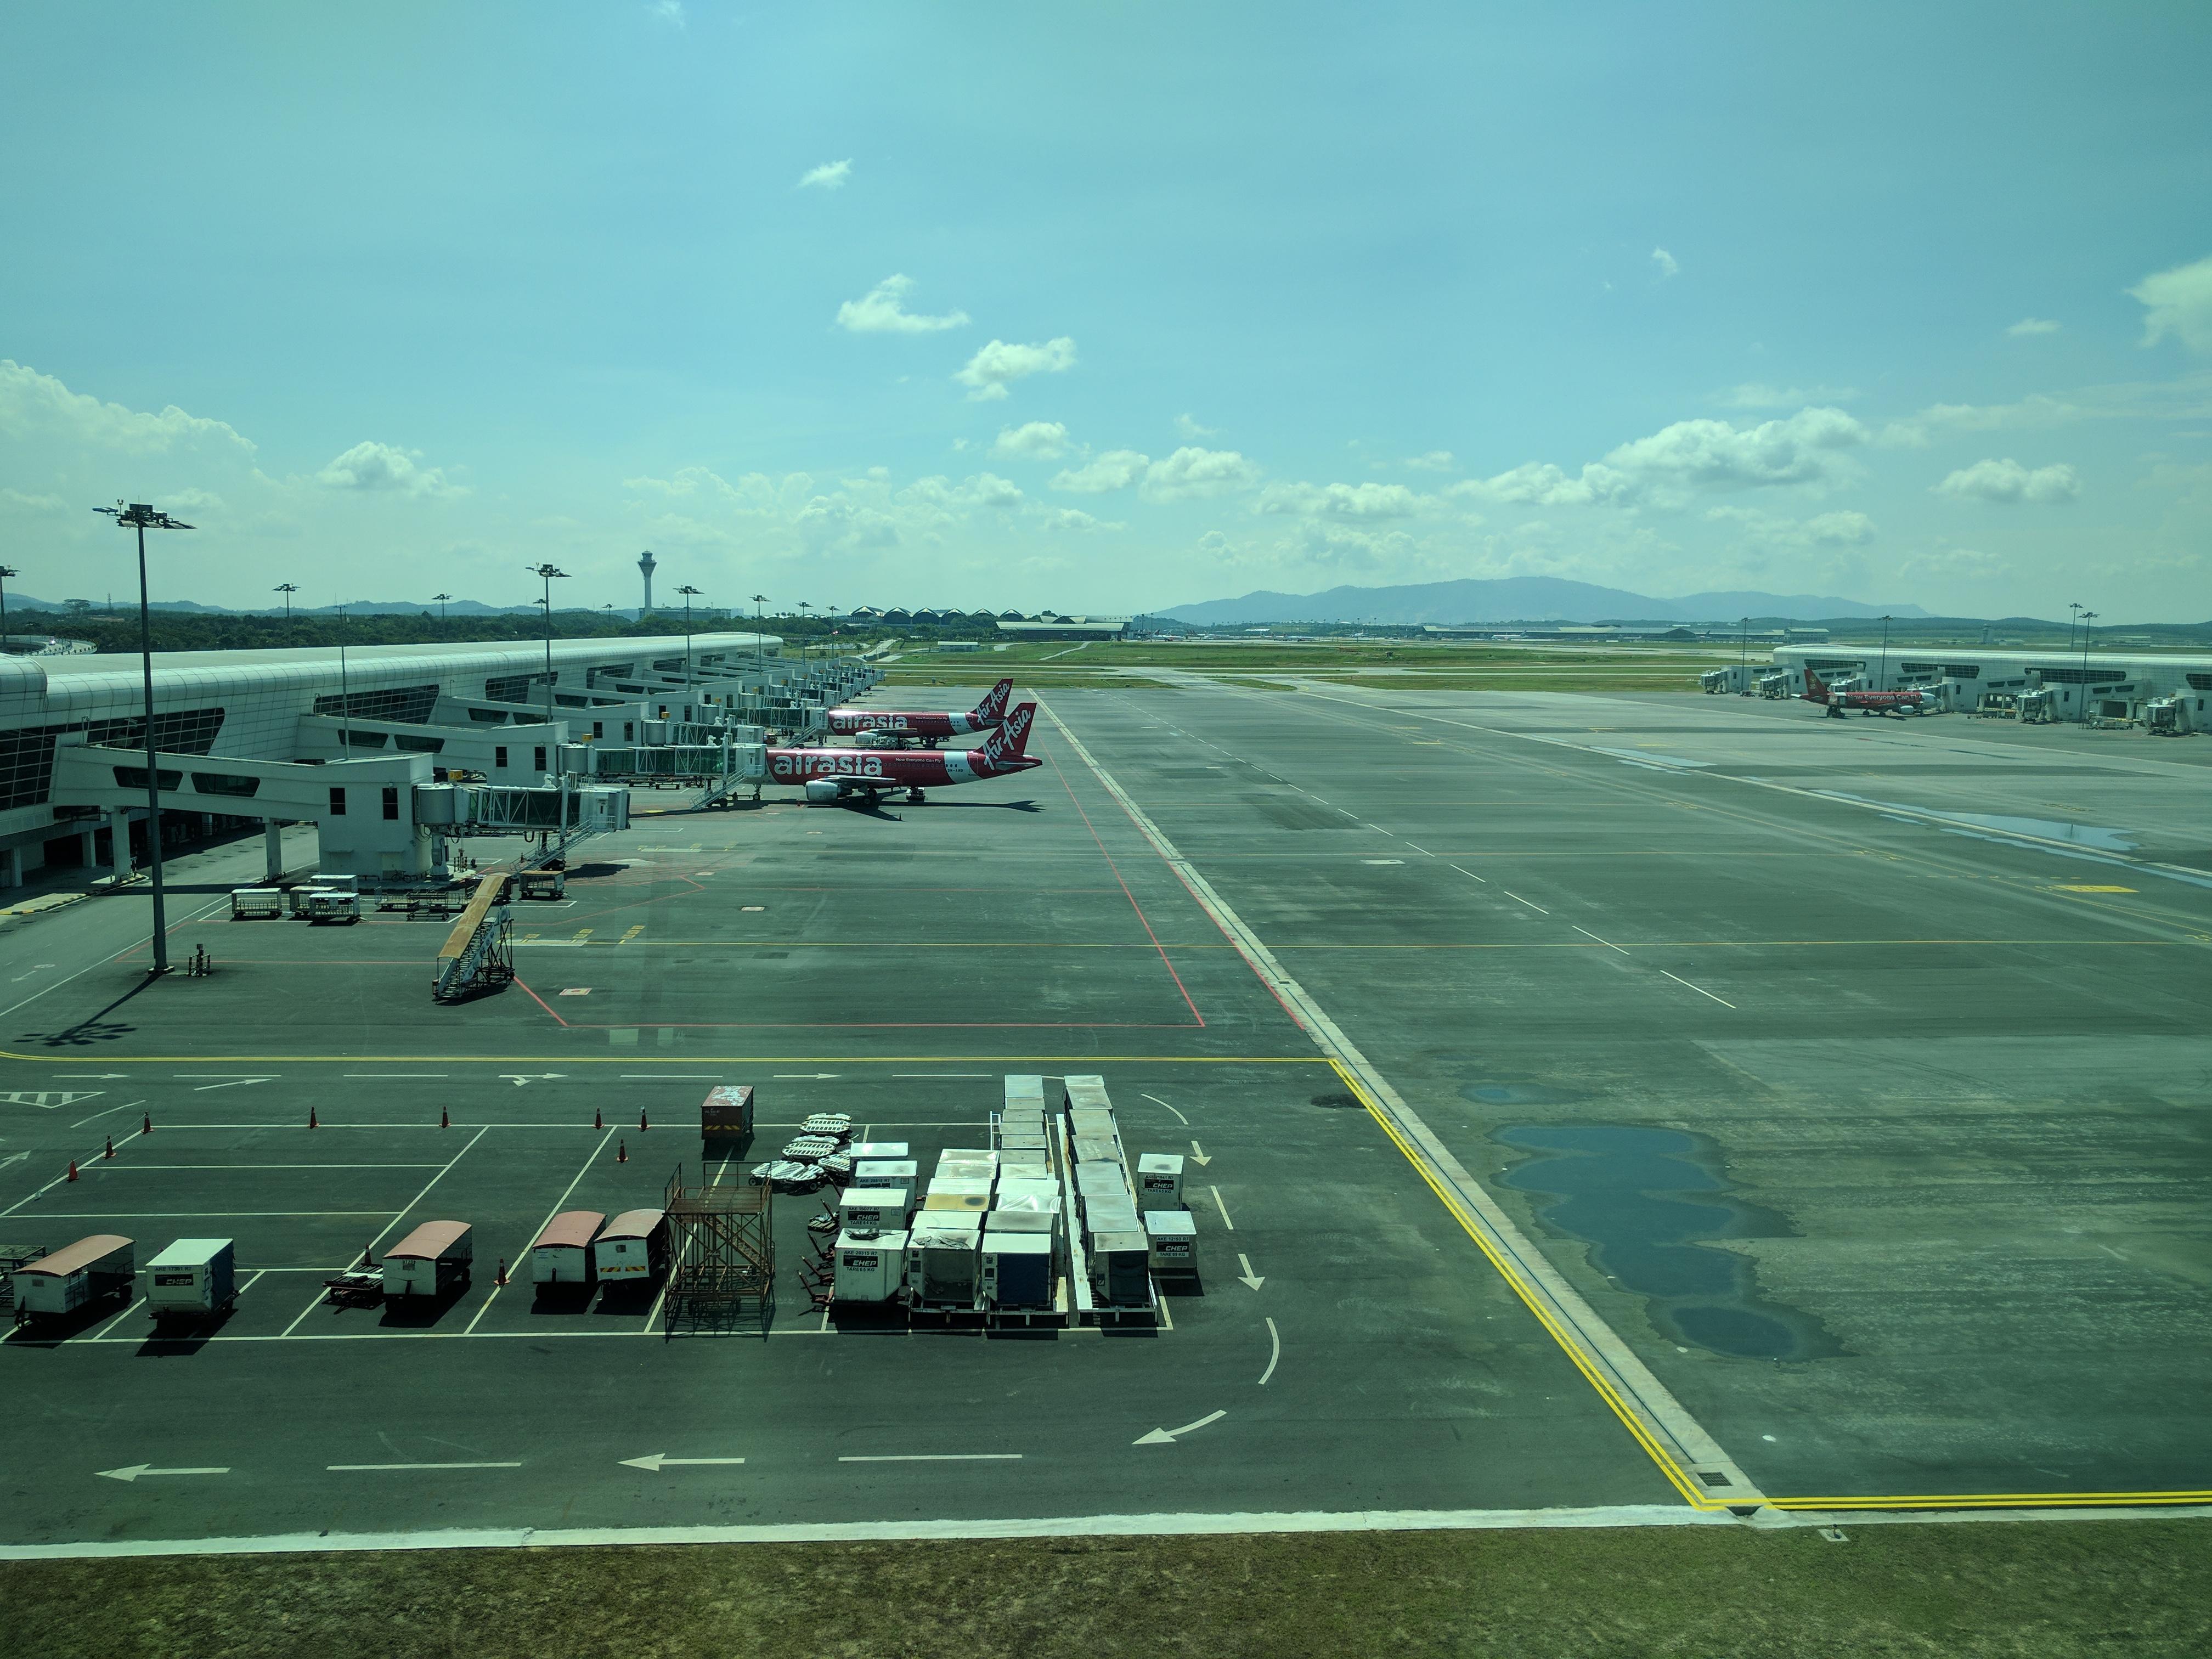 Malaisie, aéroport de KL